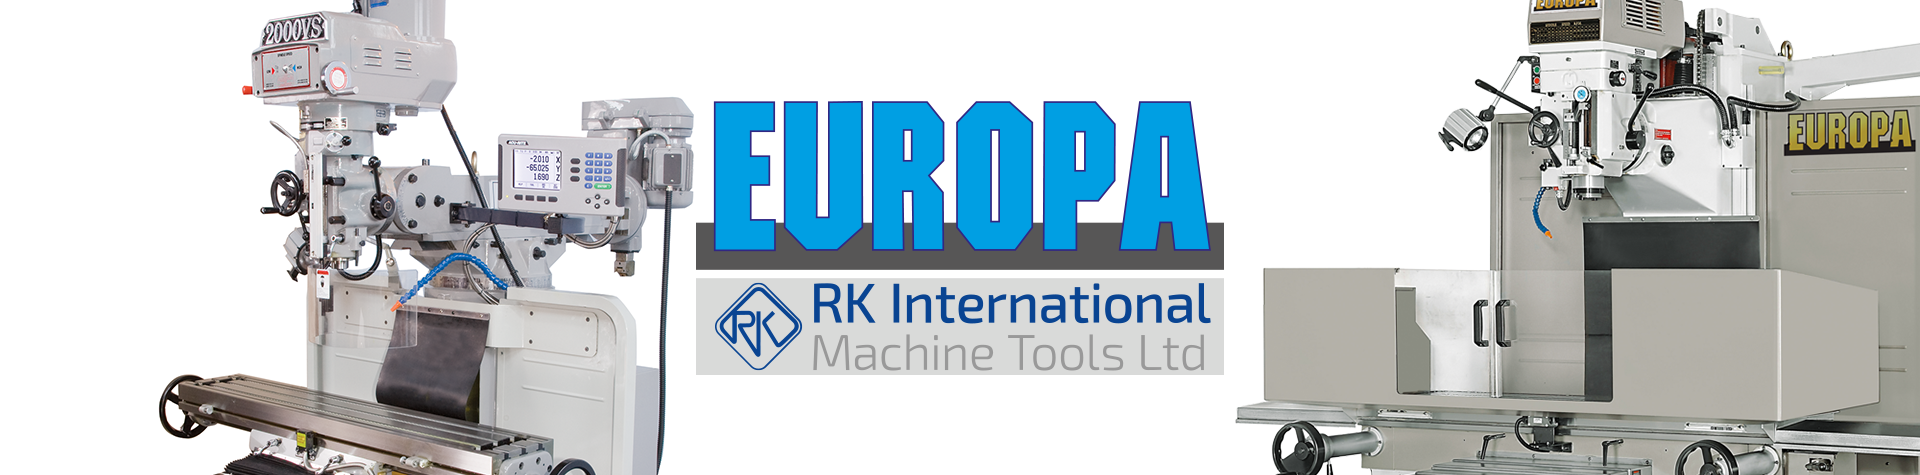 RK-Slider-Home-Page_Europa8